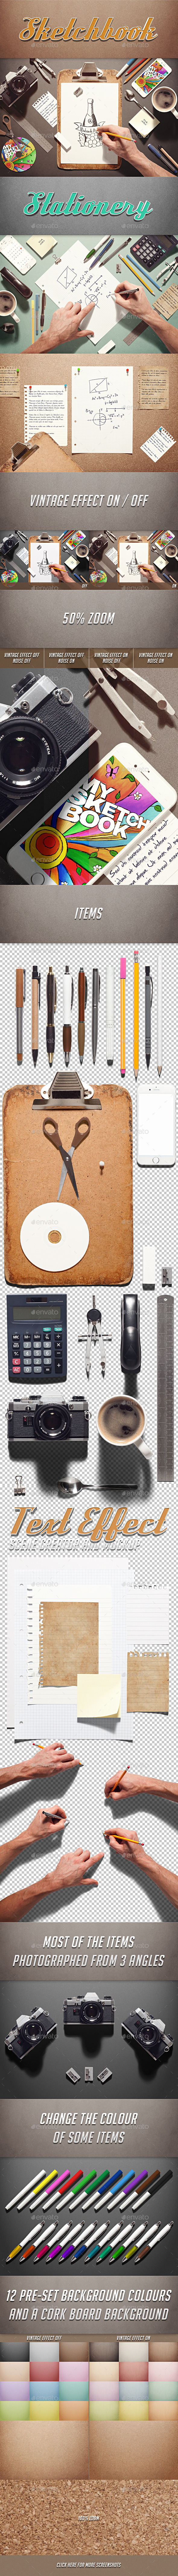 GraphicRiver Sketchbook Stationery Scene Creator 10771319